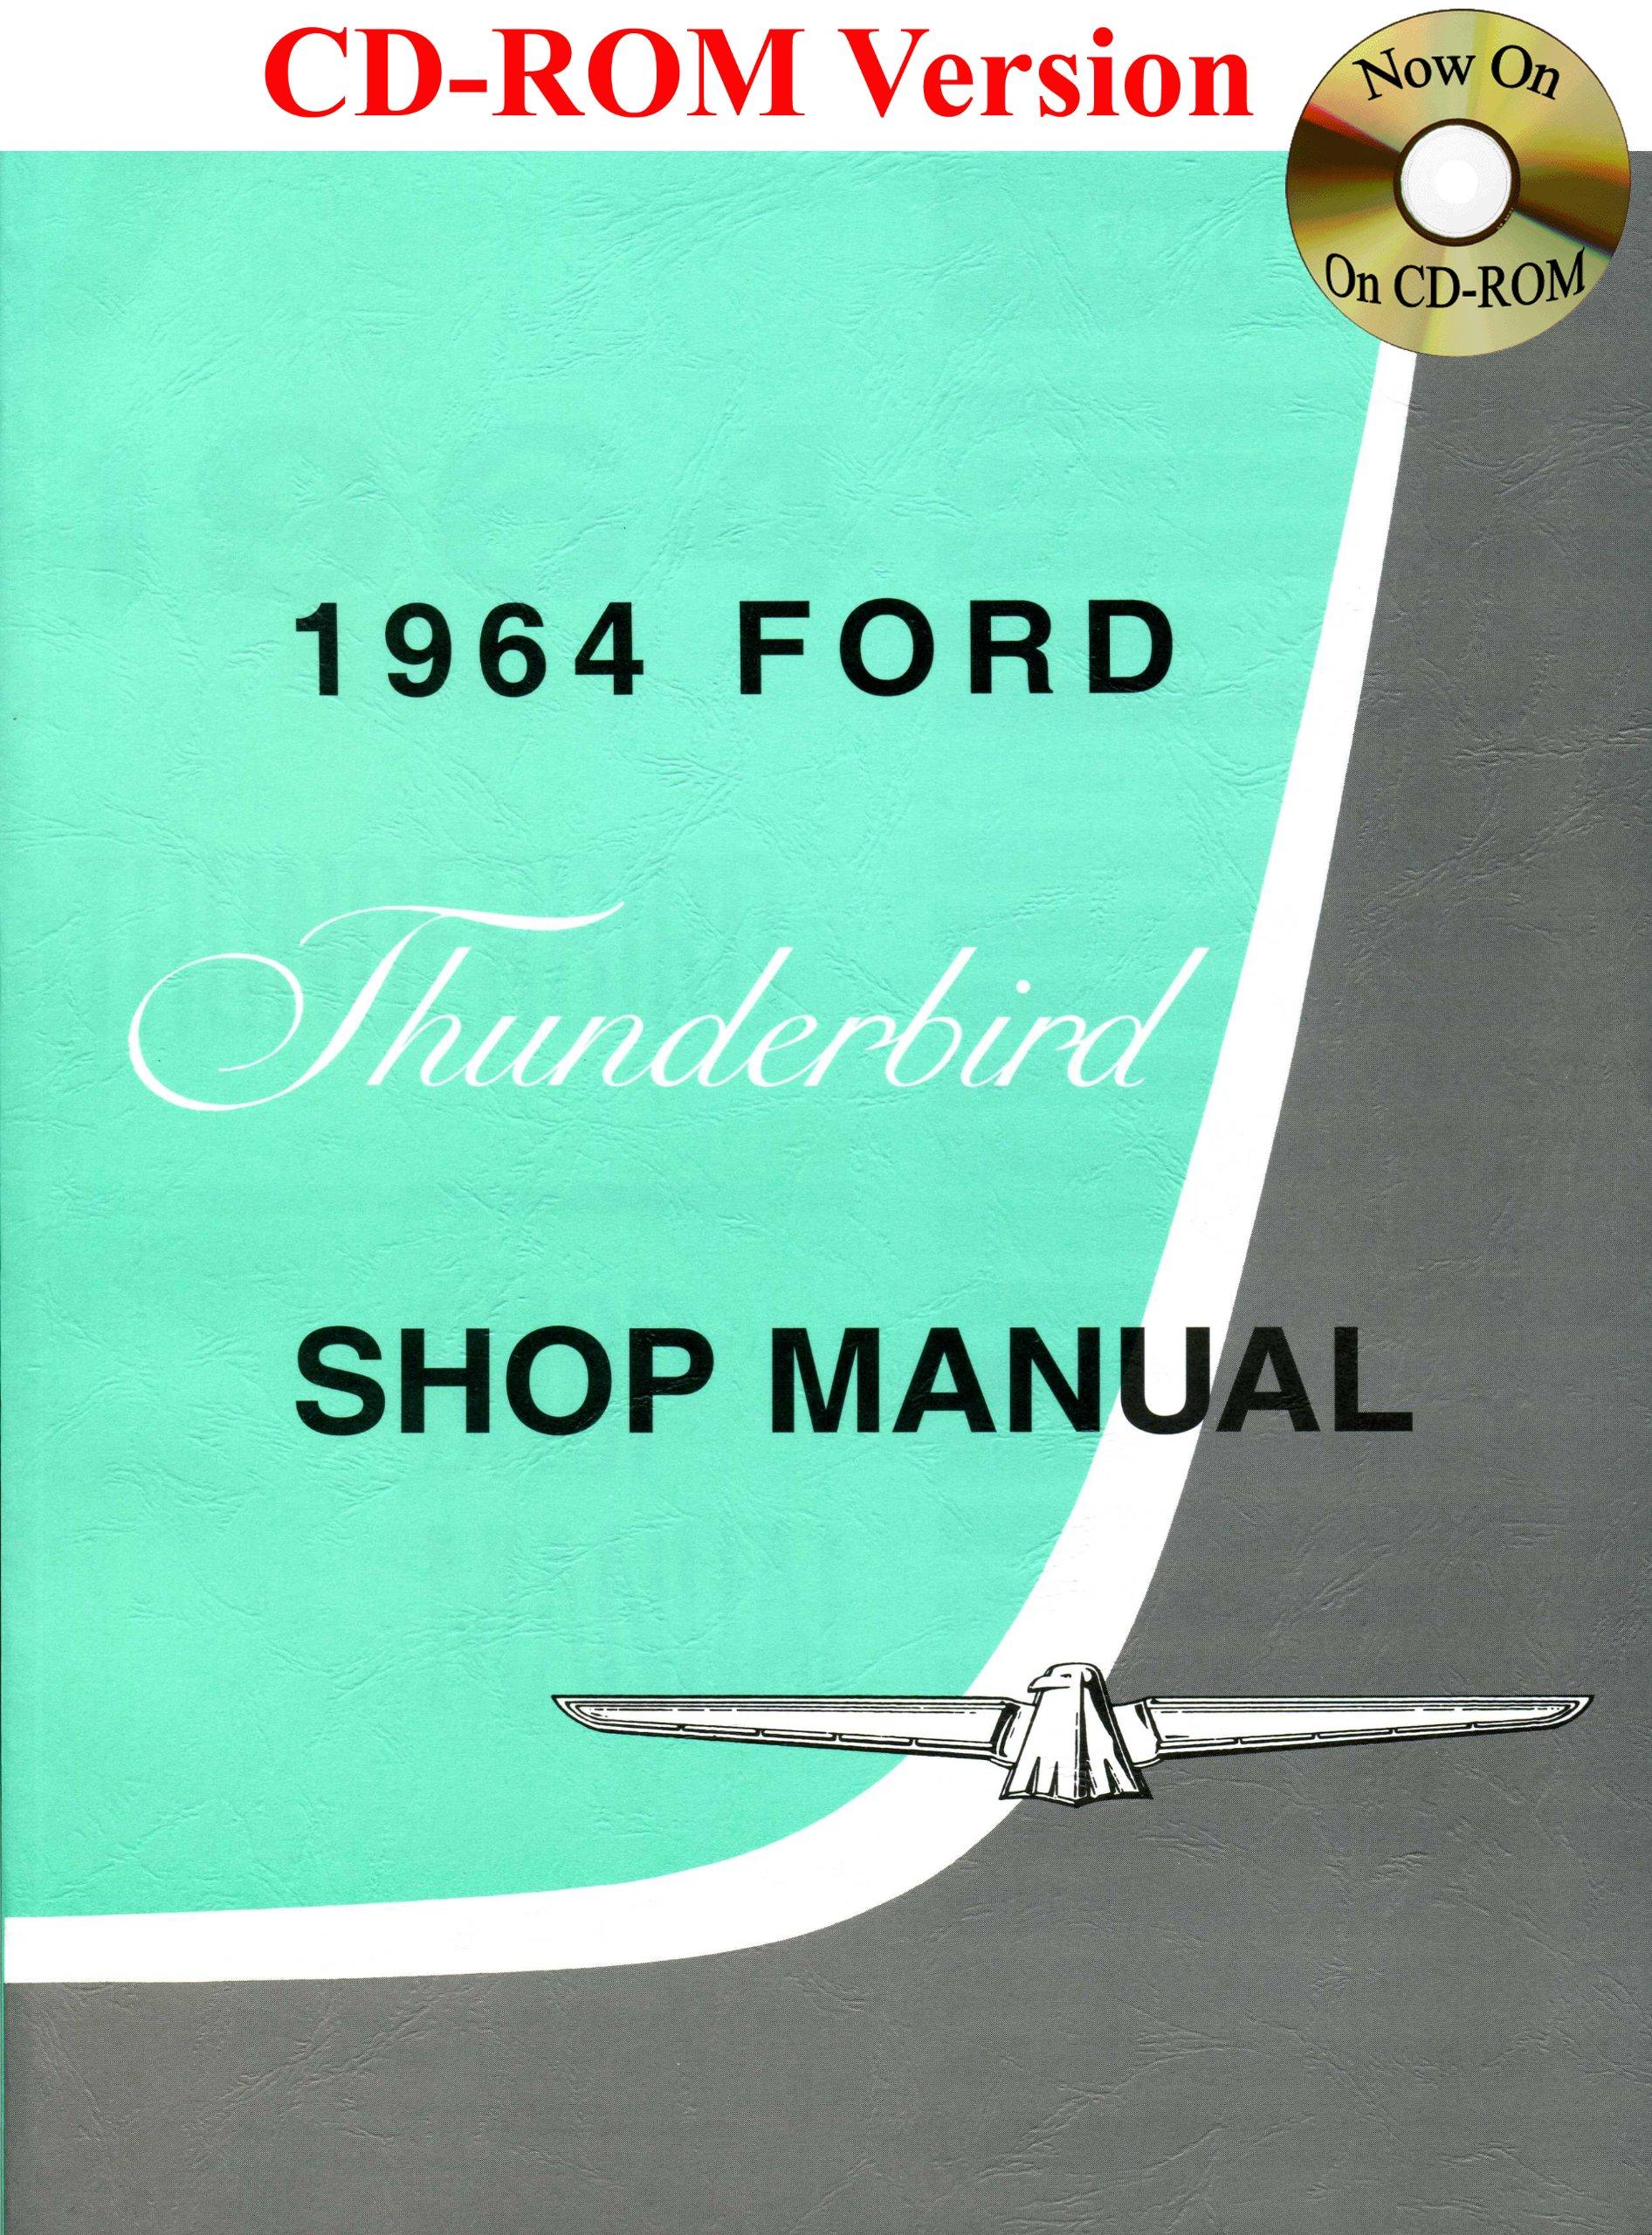 1964 Ford Thunderbird Shop Manual: Ford Motor Company, David E. LeBlanc:  9781603710145: Amazon.com: Books